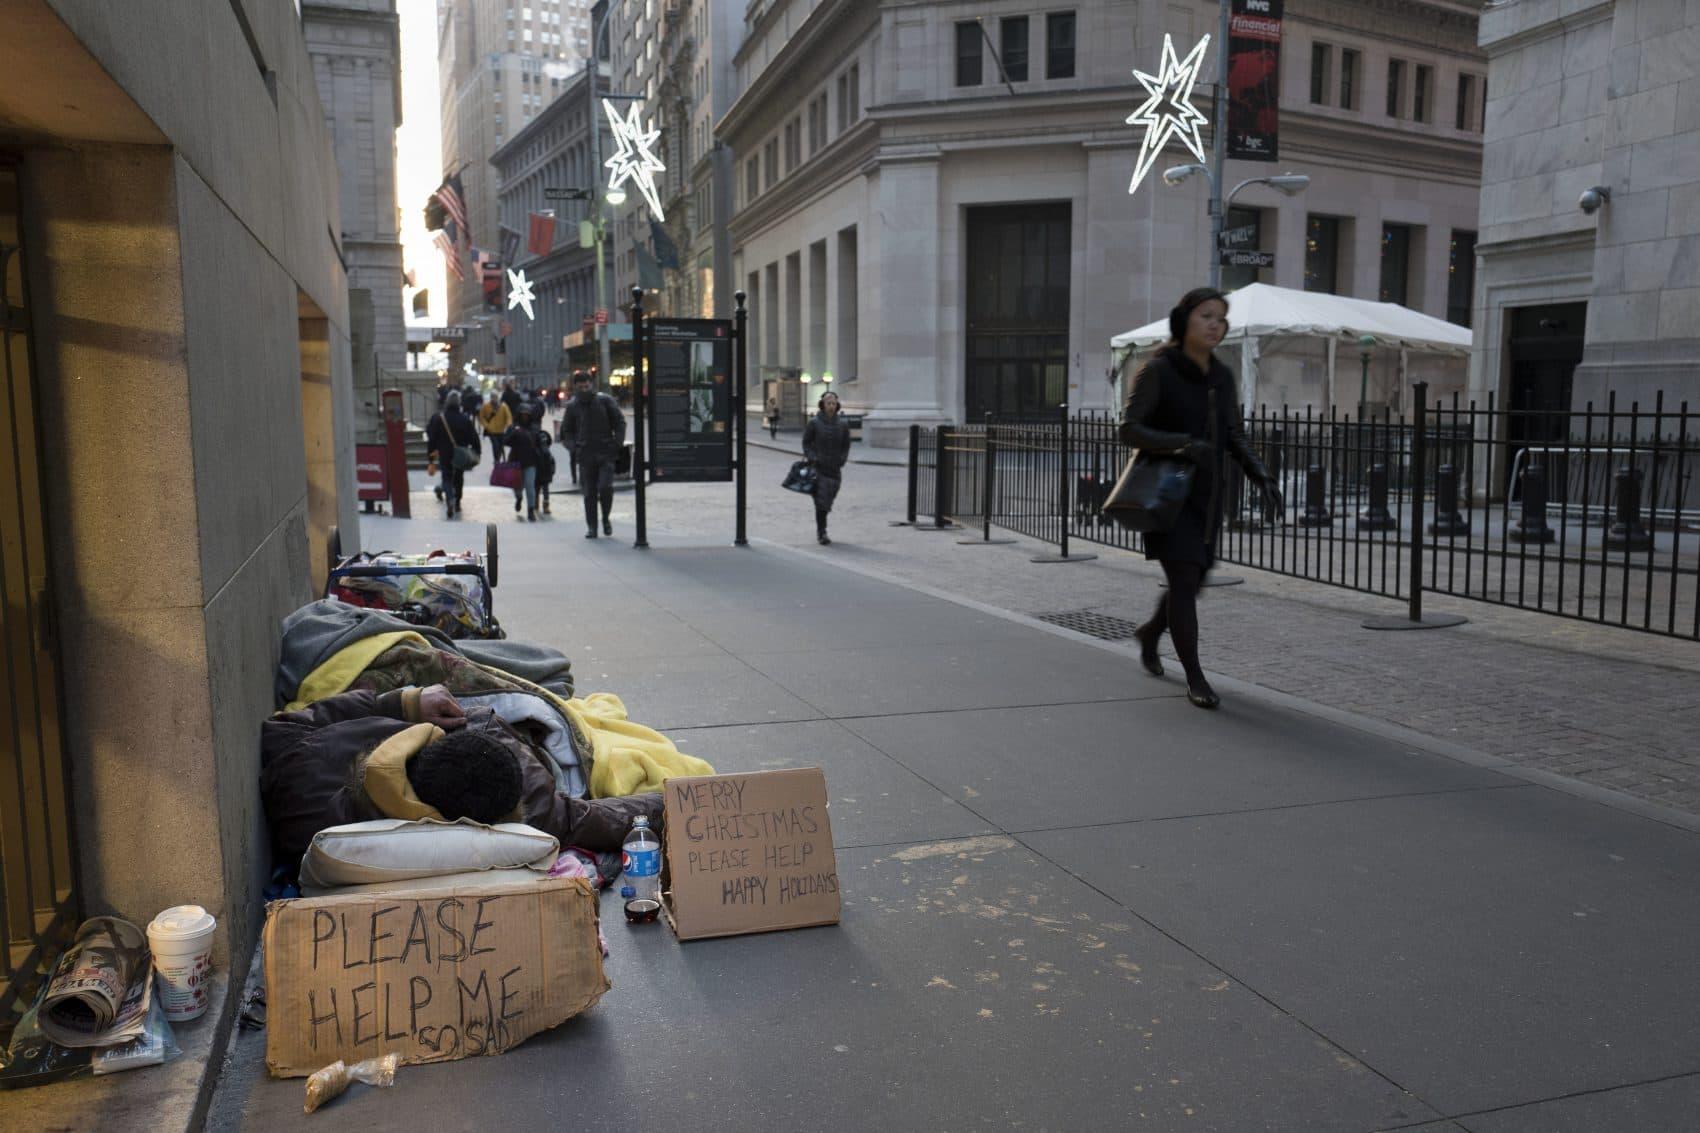 A homeless man sleeps on Wall Street near the New York Stock Exchange, Wednesday, Dec. 21, 2016. (Mark Lennihan/AP)